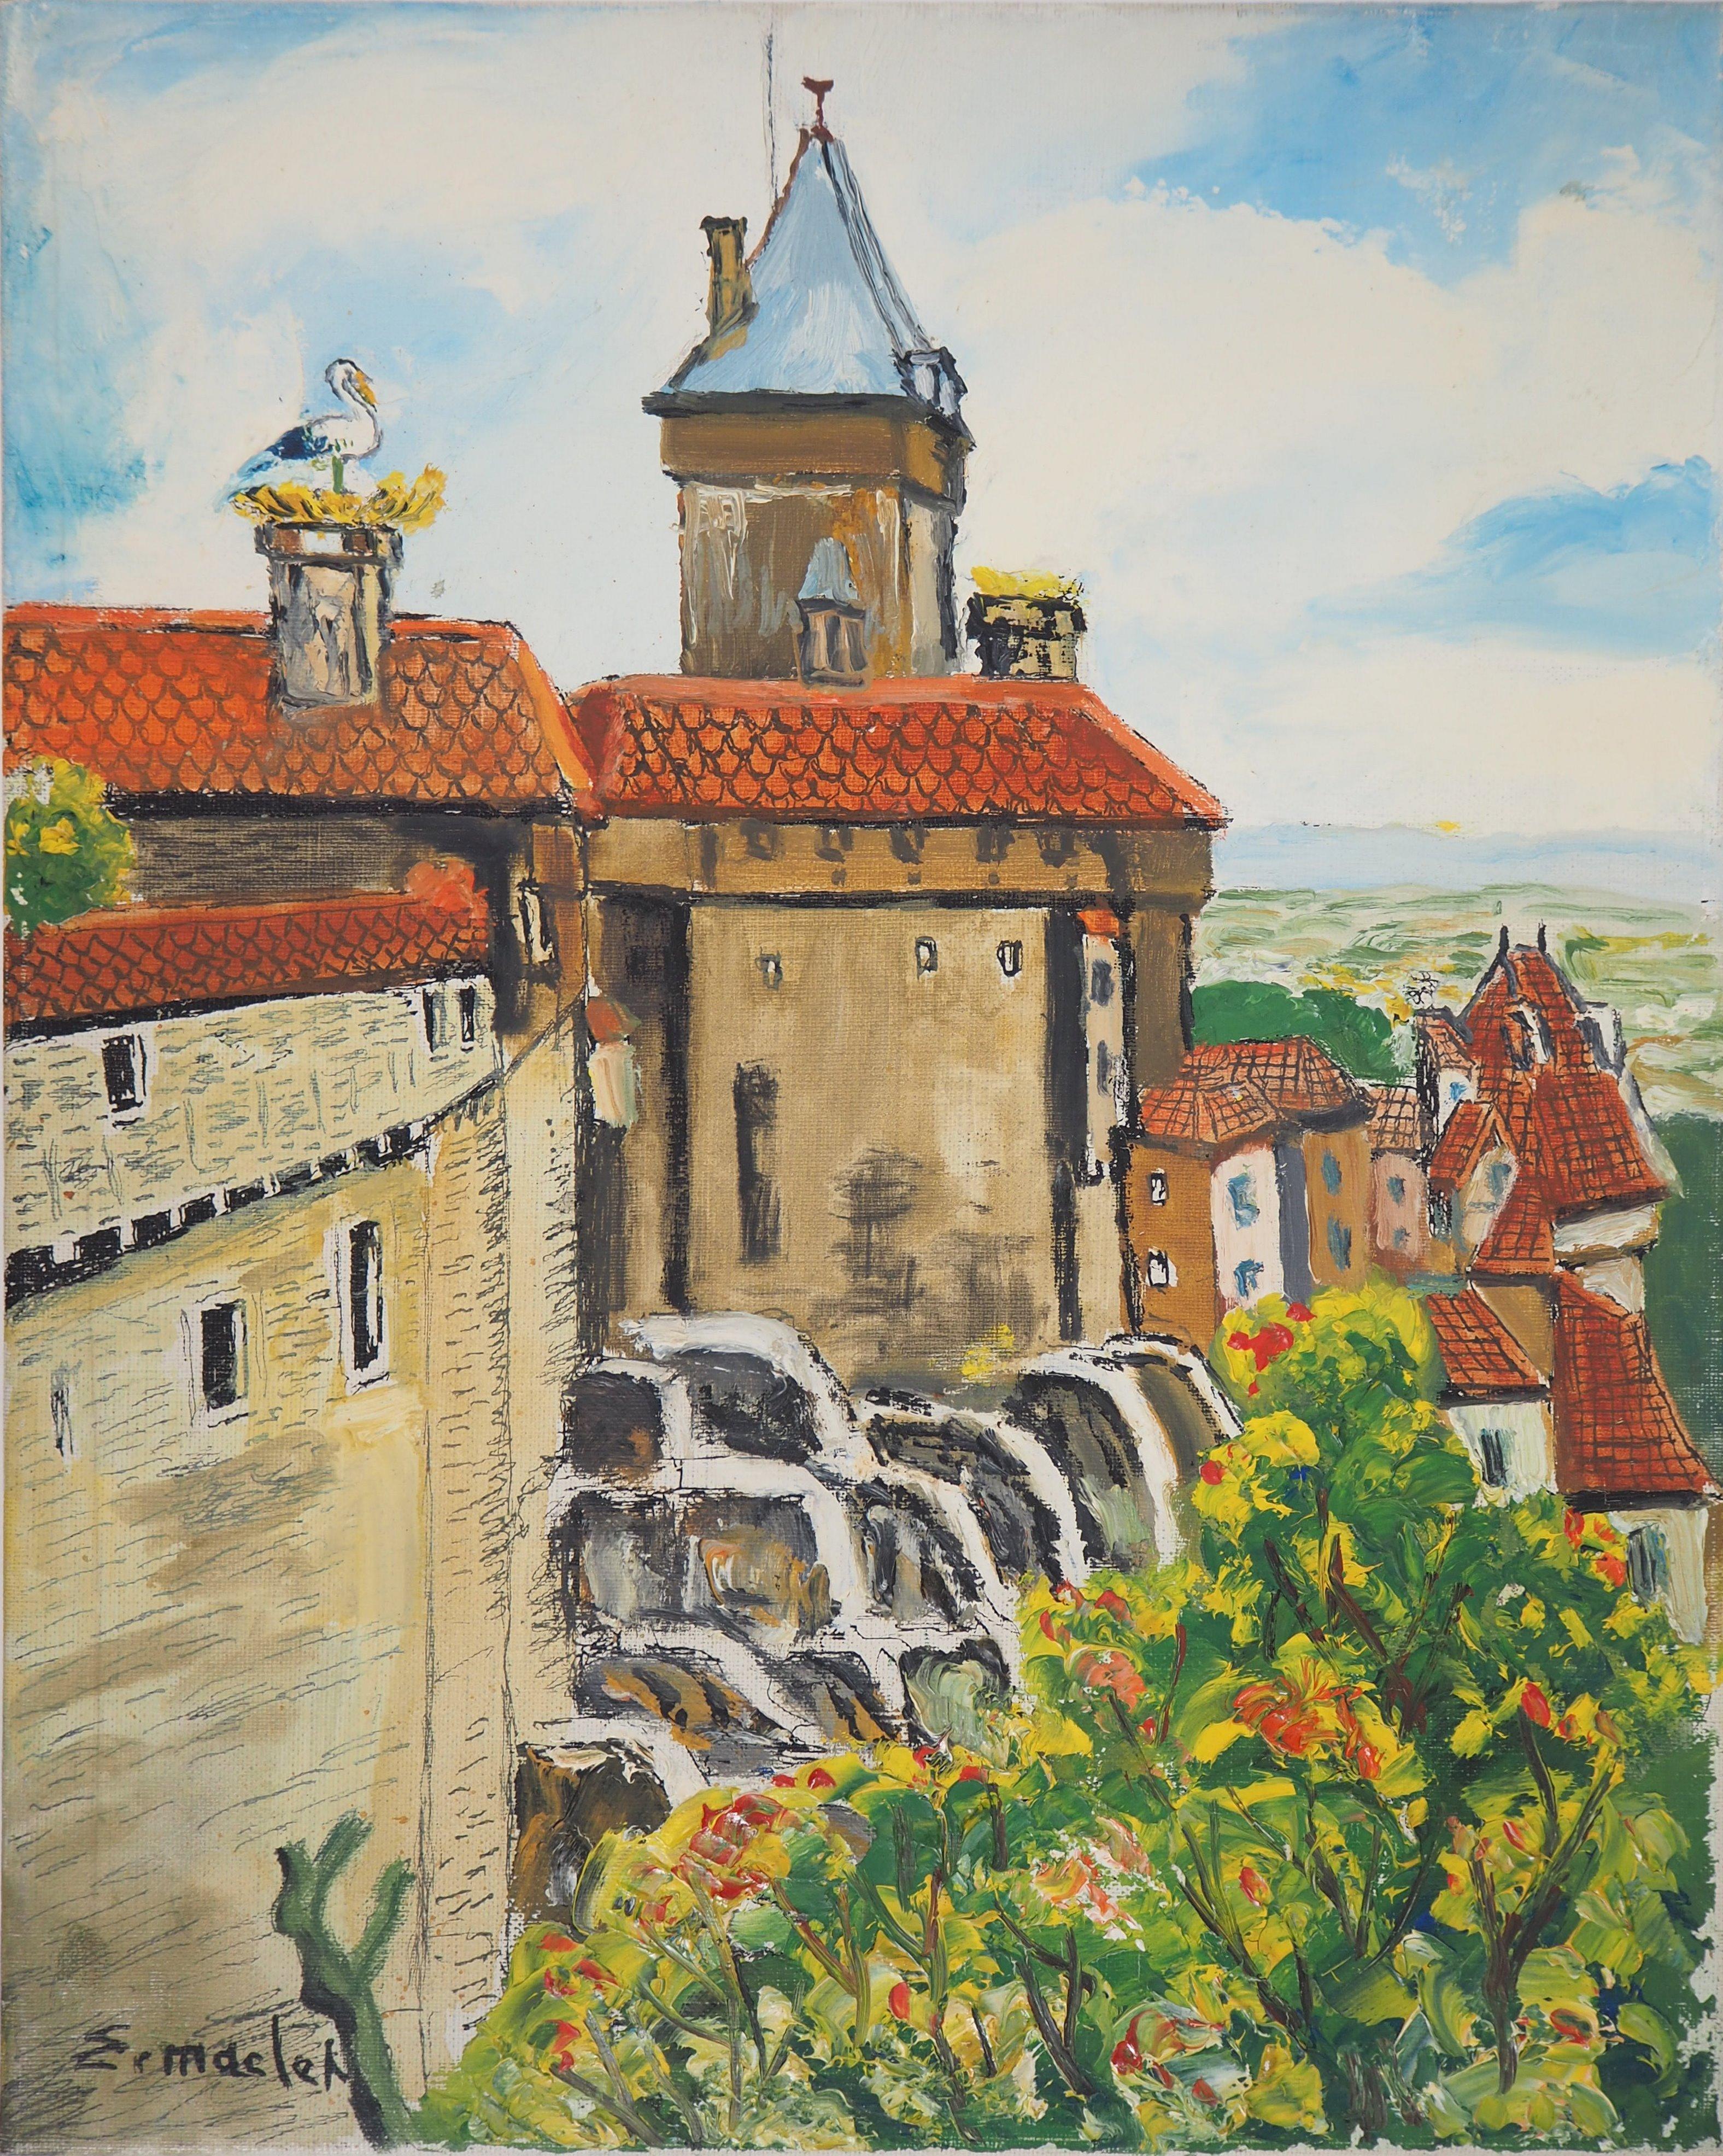 Alsace : Haut-Kœnigsbourg Castle - Original Oil on Canvas, Handsigned, c. 1930